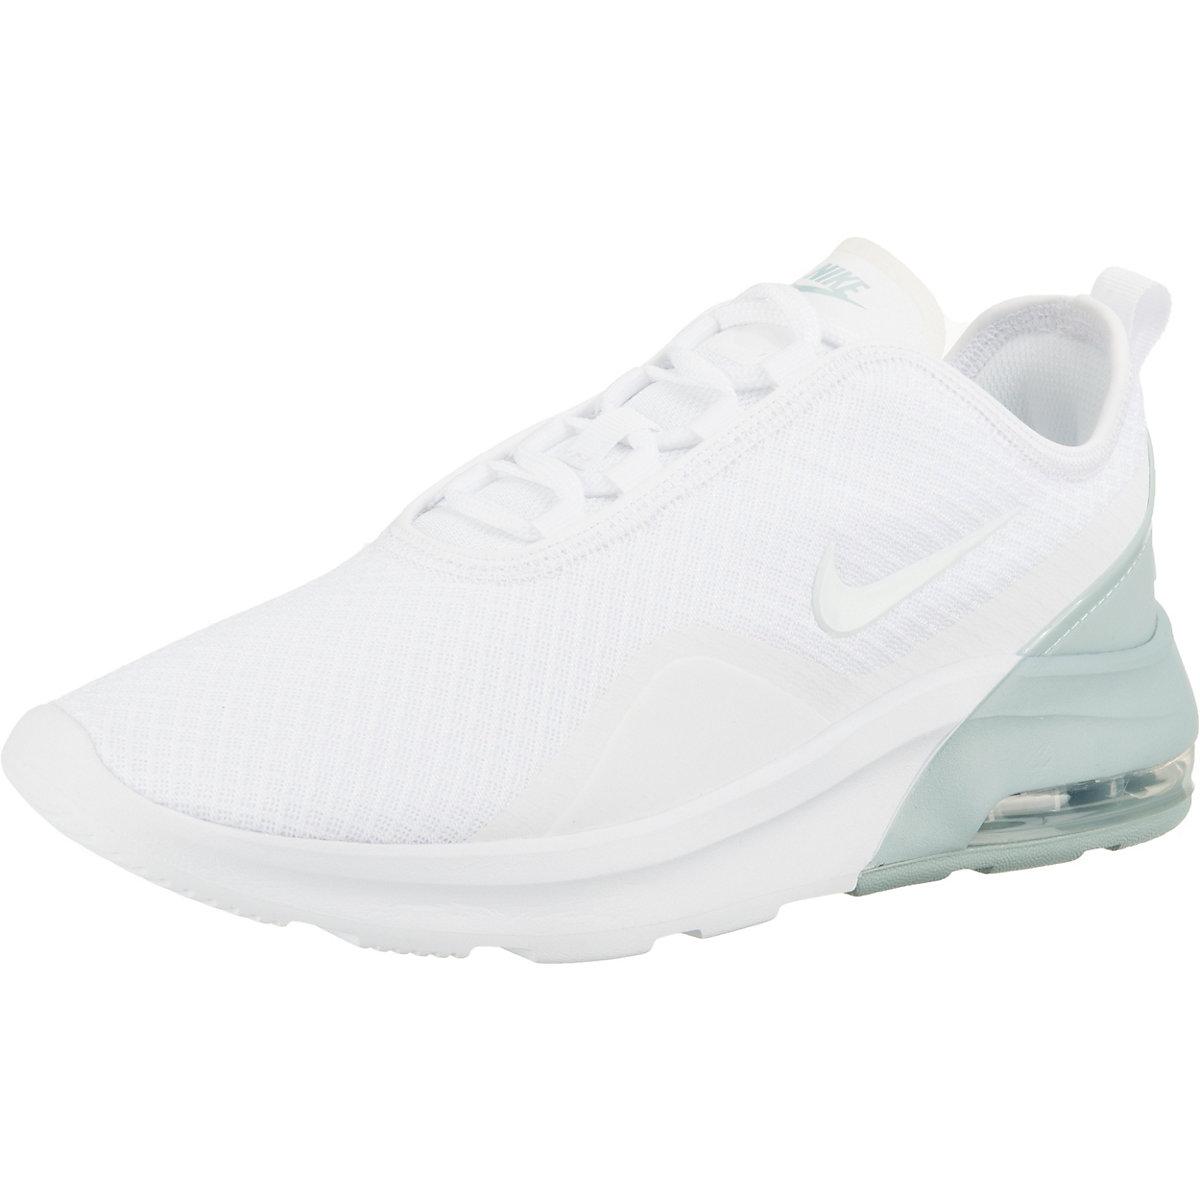 Nike Sportswear, Air Max Motion 2 Turnschuhe Low, weiß  Gute Qualität beliebte Schuhe